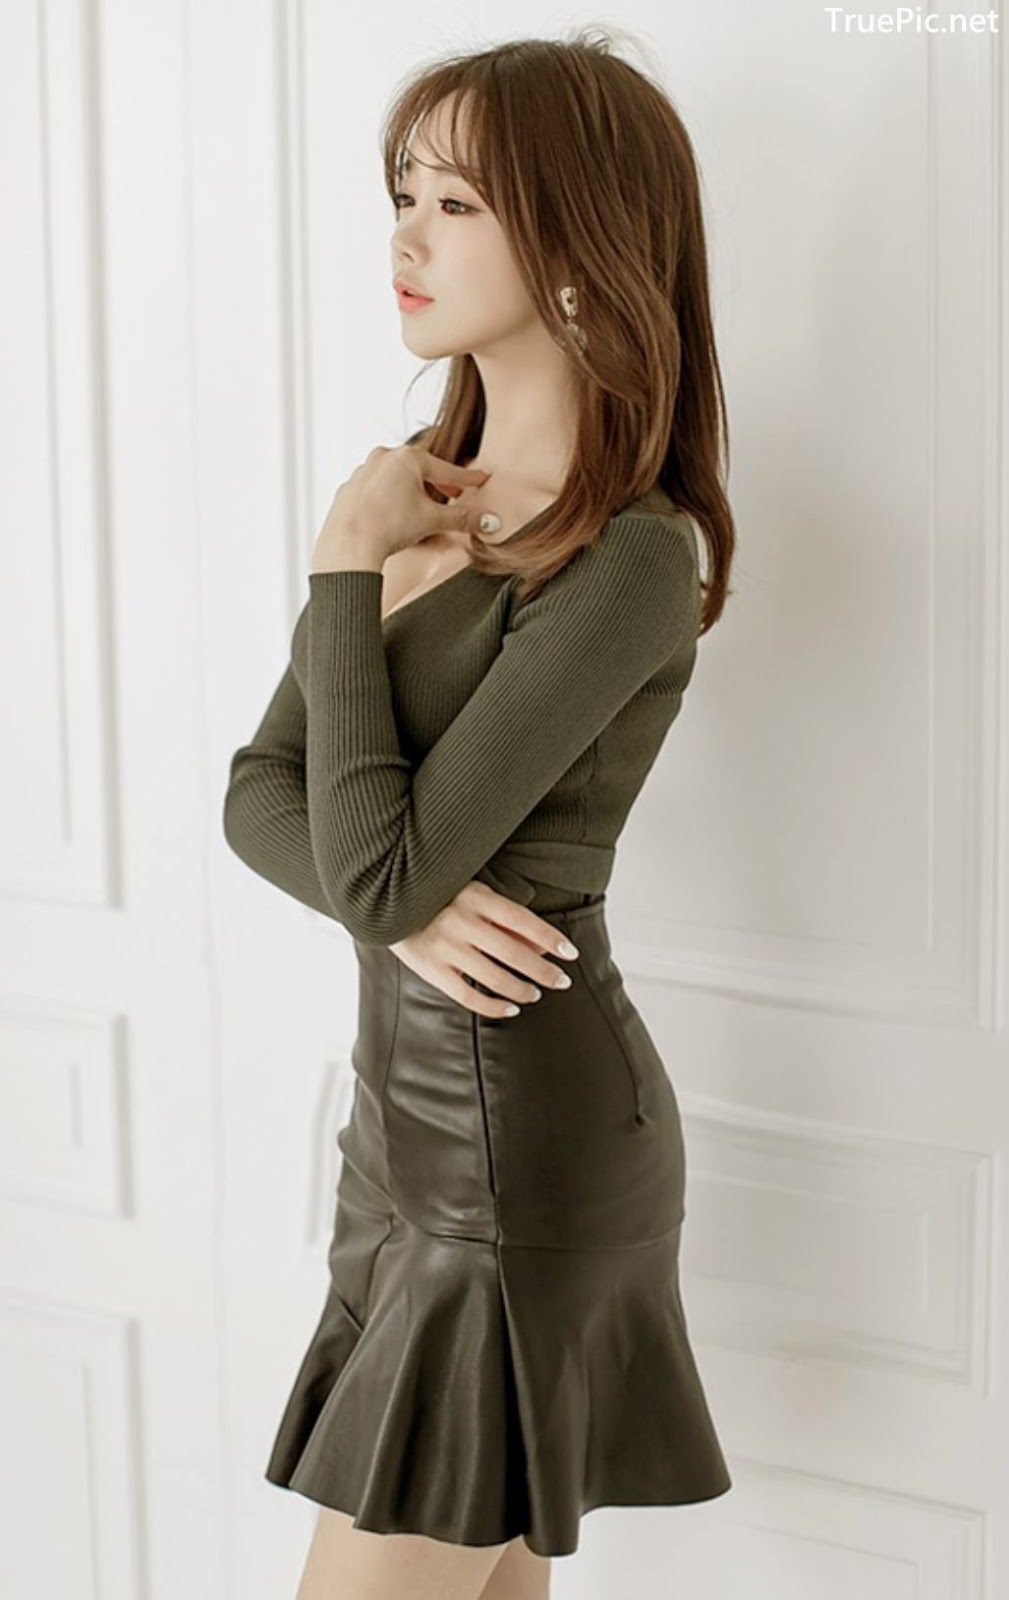 Image-Korean-Fashion-Model–Kang-Eun-Wook–Indoor-Photoshoot-Collection-2-TruePic.net- Picture-2